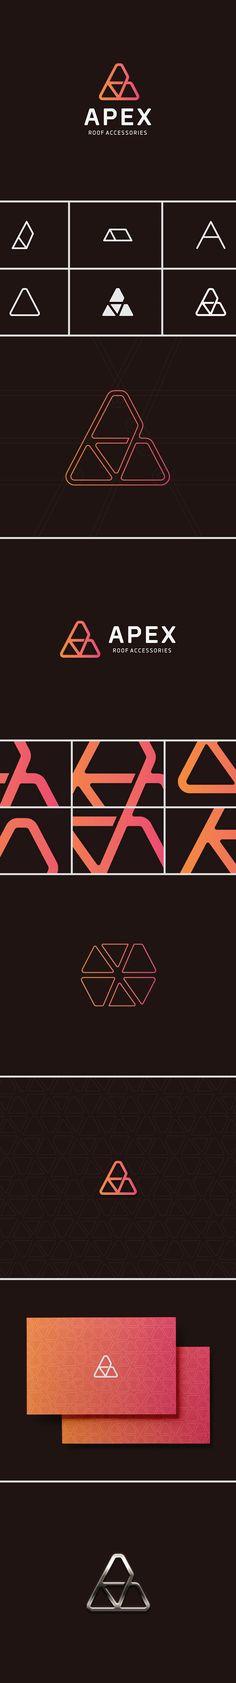 APEX by Cheltsov Kirill, via Behance